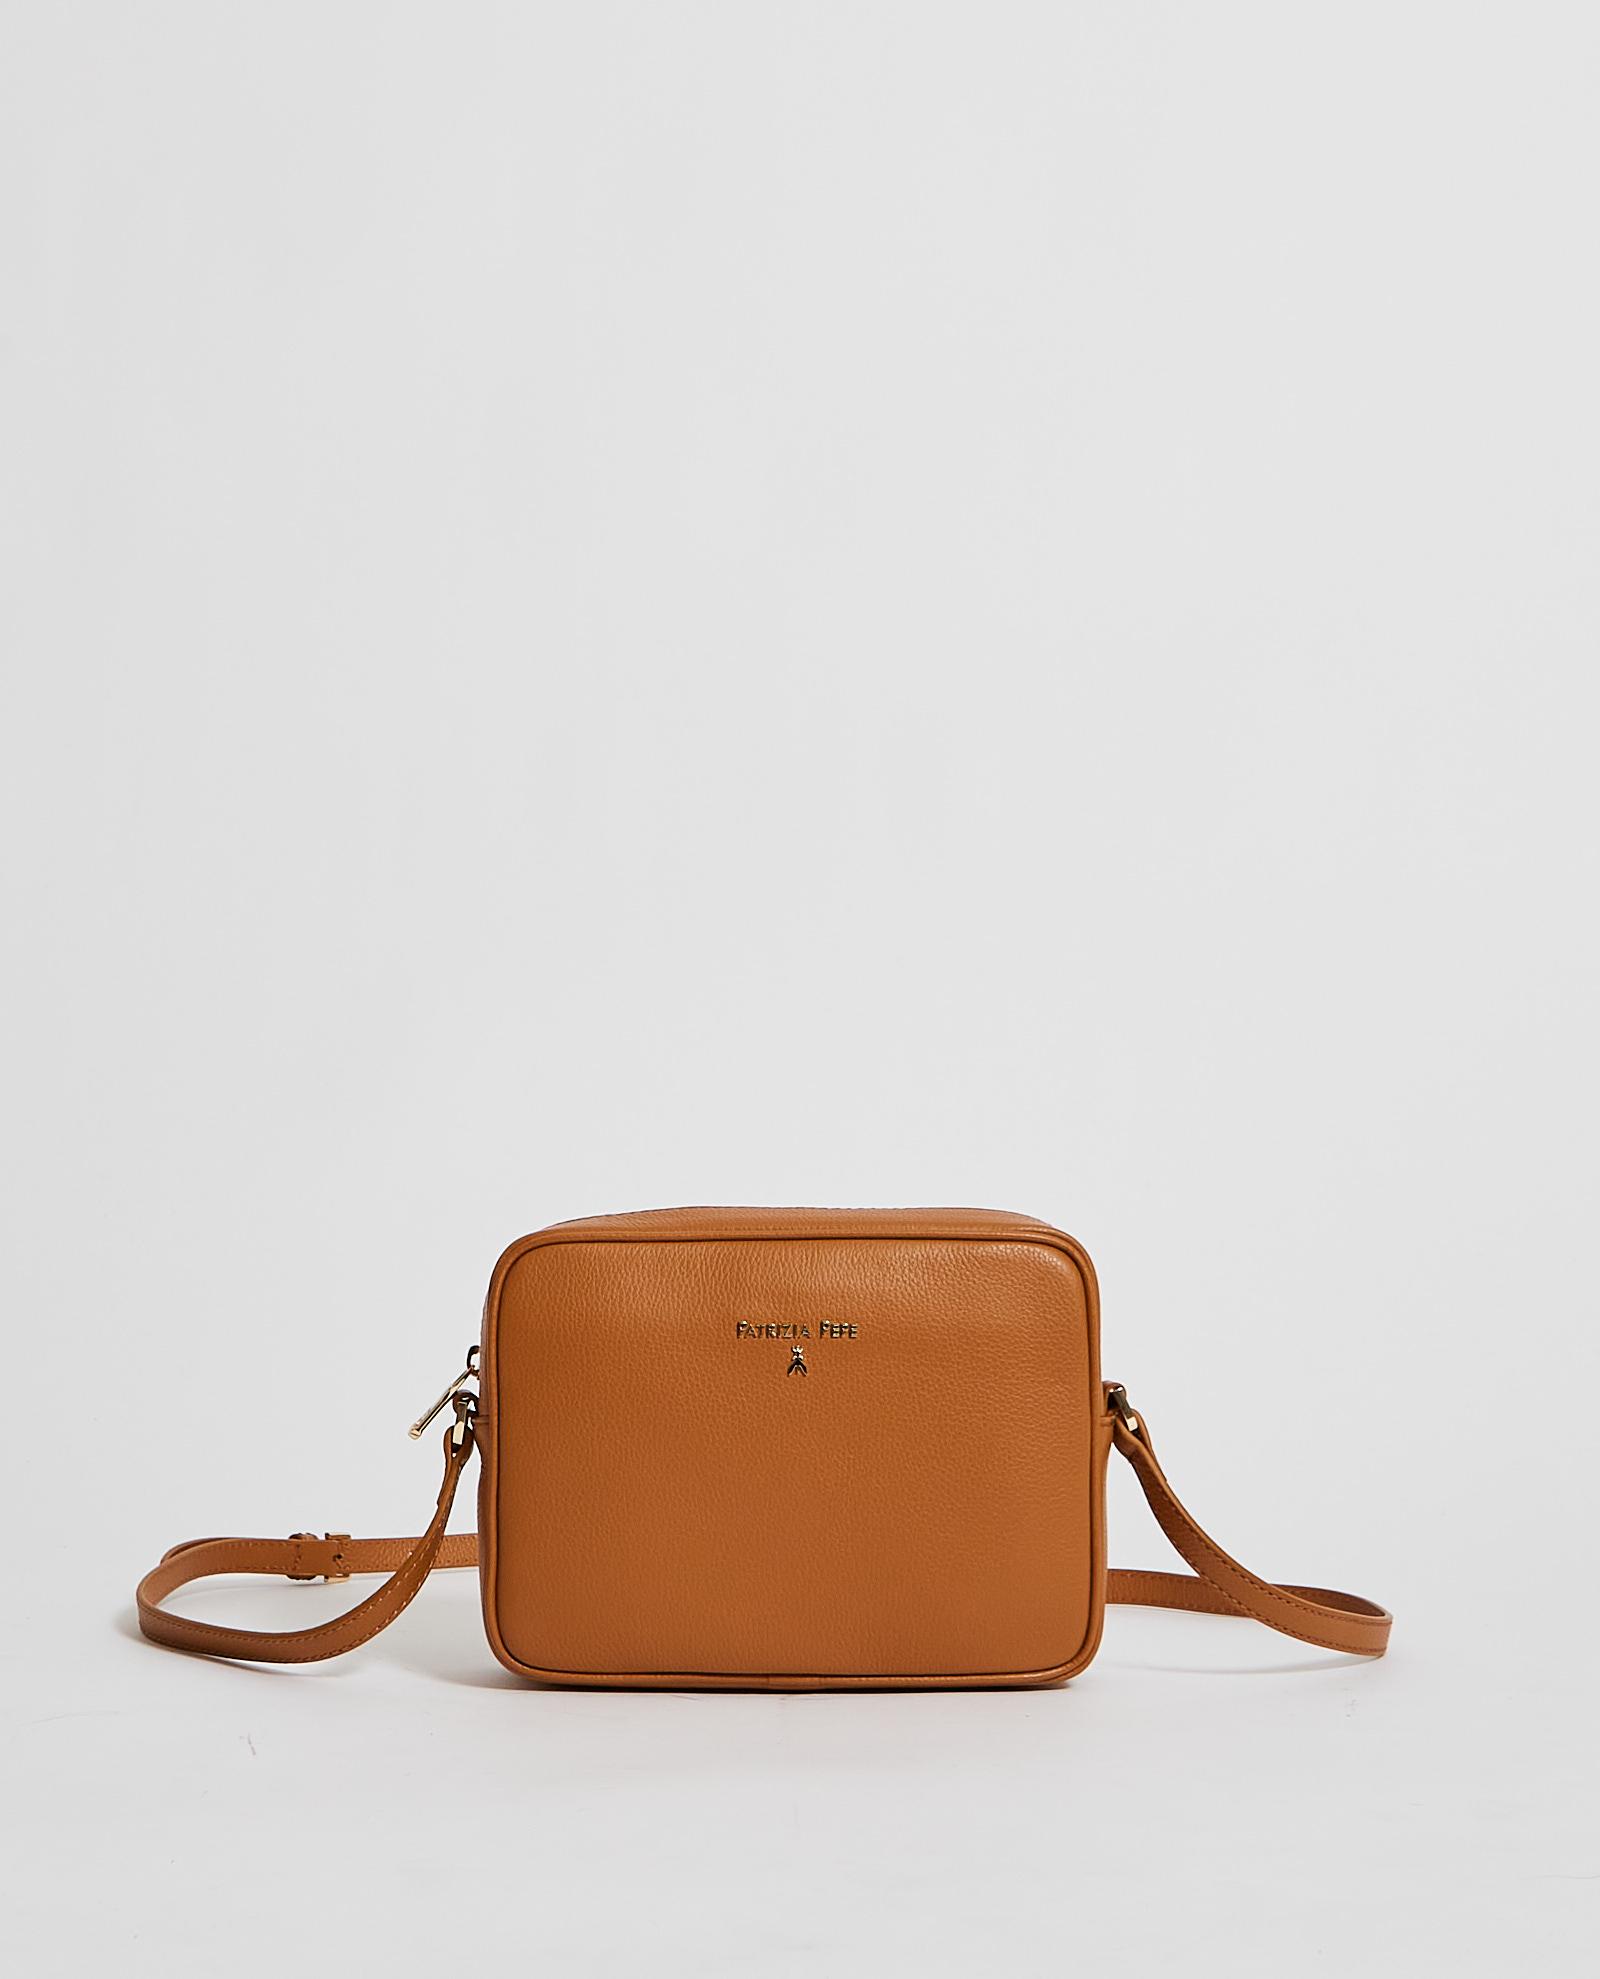 Mini bag Patrizia pepe PATRIZIA PEPE   Borsa   2V8985-A4U8NB667